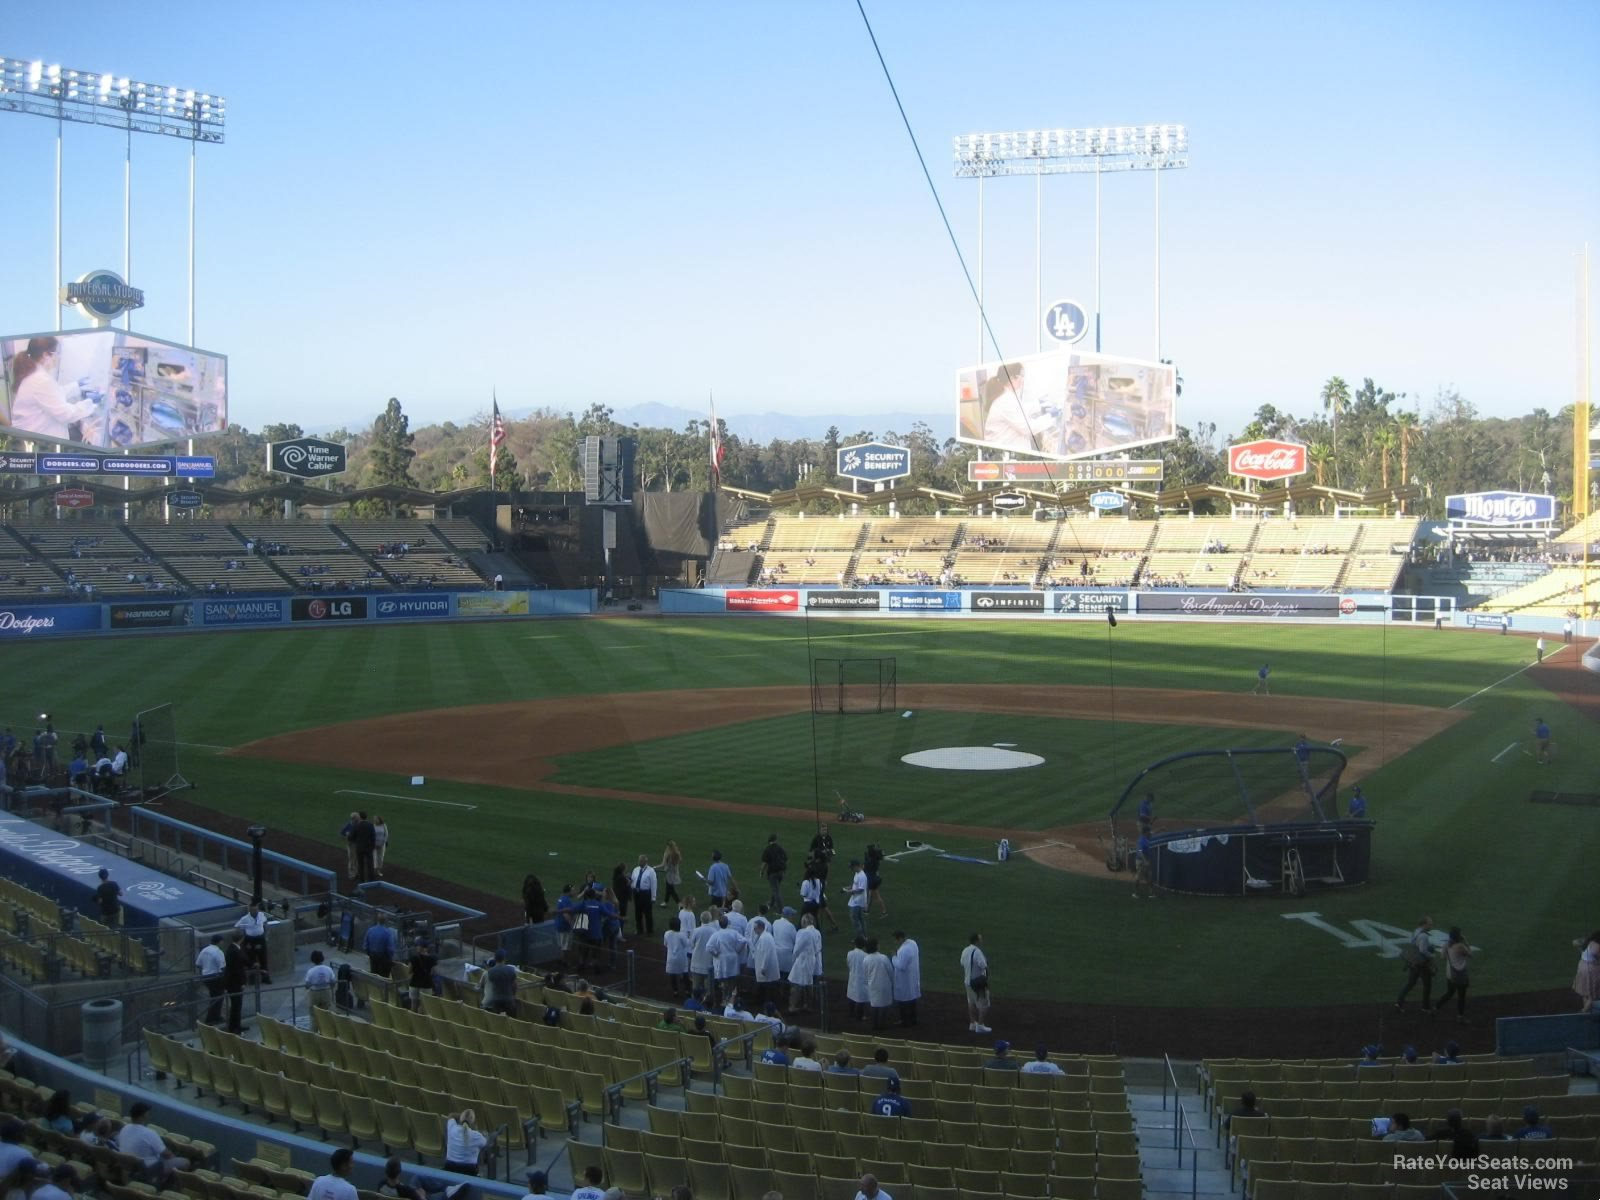 Dodger Stadium Section 111 - RateYourSeats.com